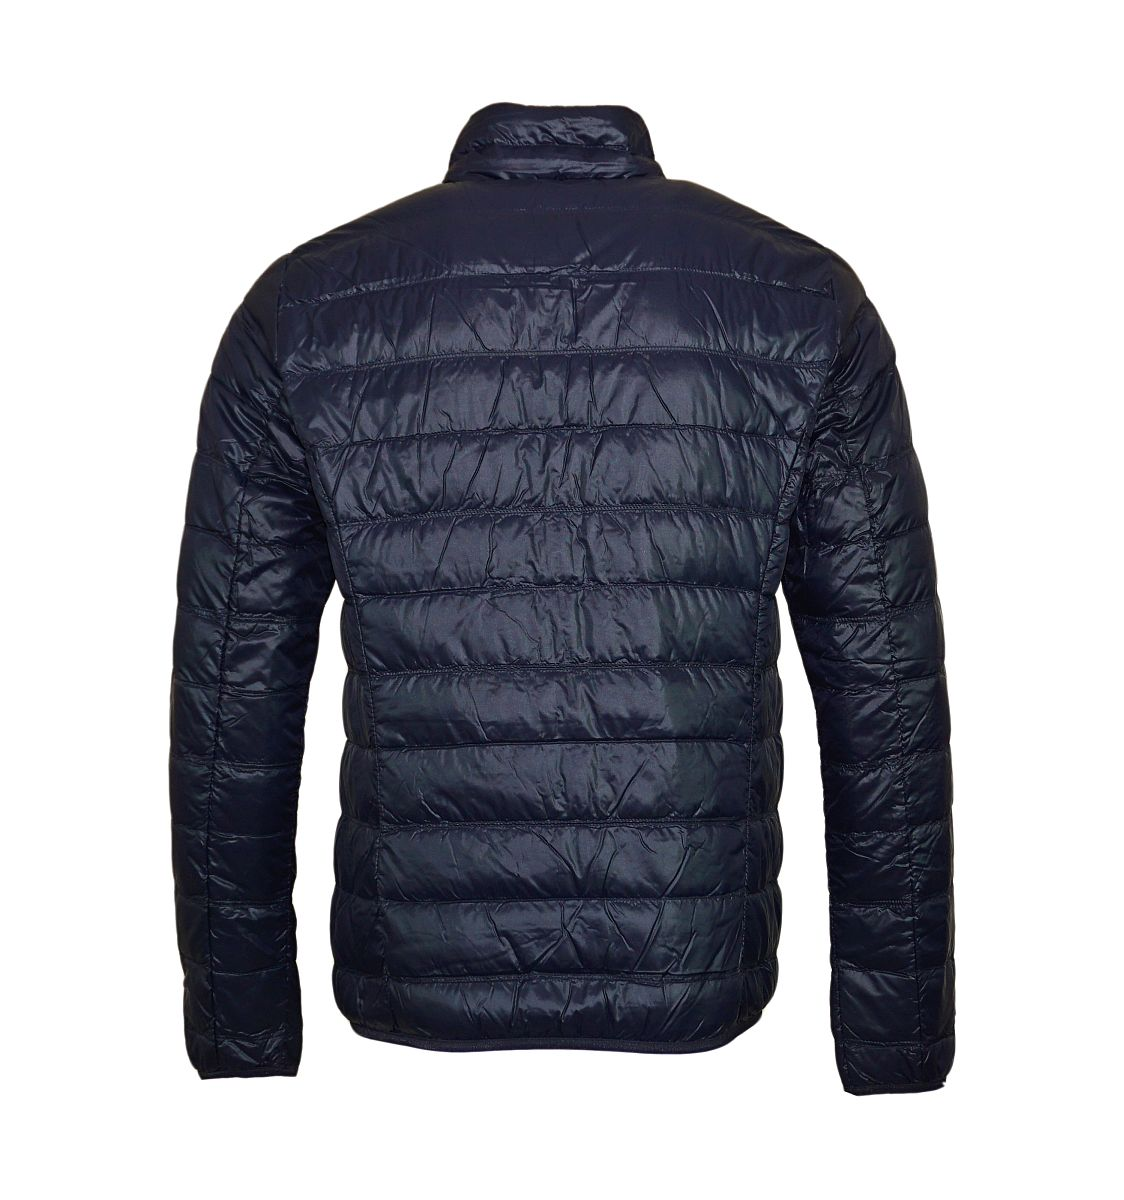 EA7 Emporio Armani Down Jacket Daunenjacke 8NPB01 PN29Z 1578 Night Blue SH17-EA7J1